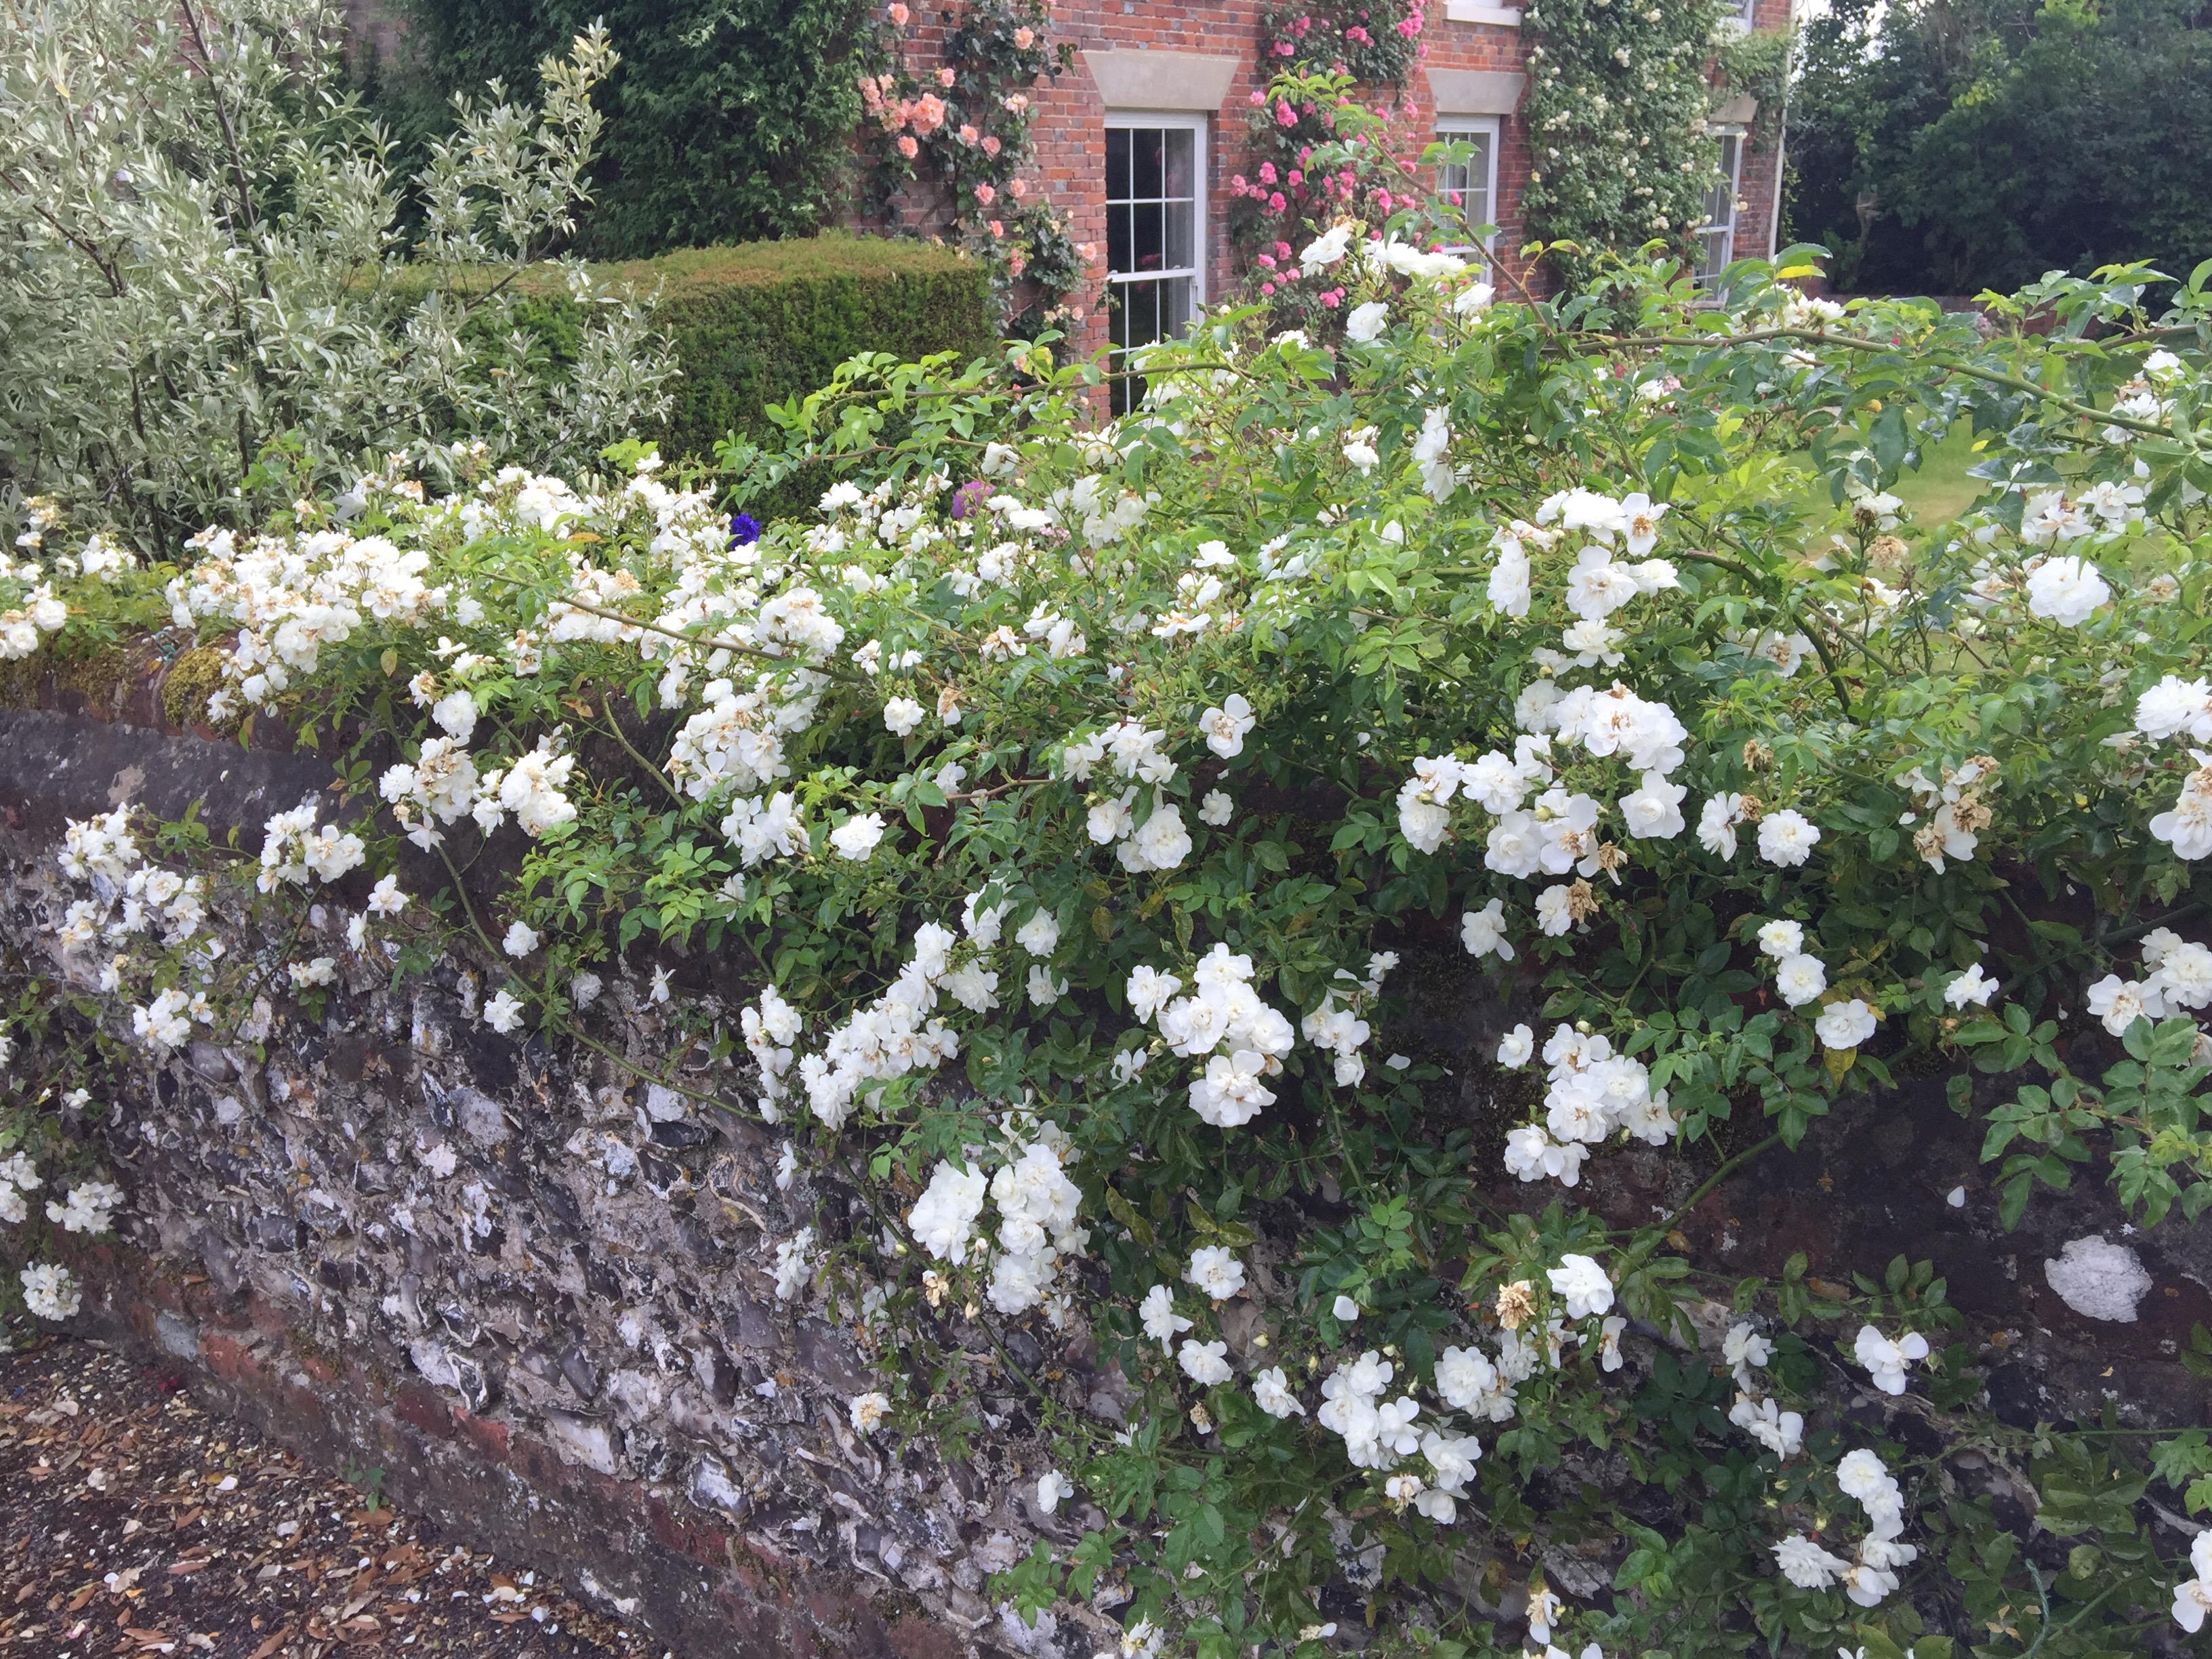 img 2858 Pruning once flowering rambling roses